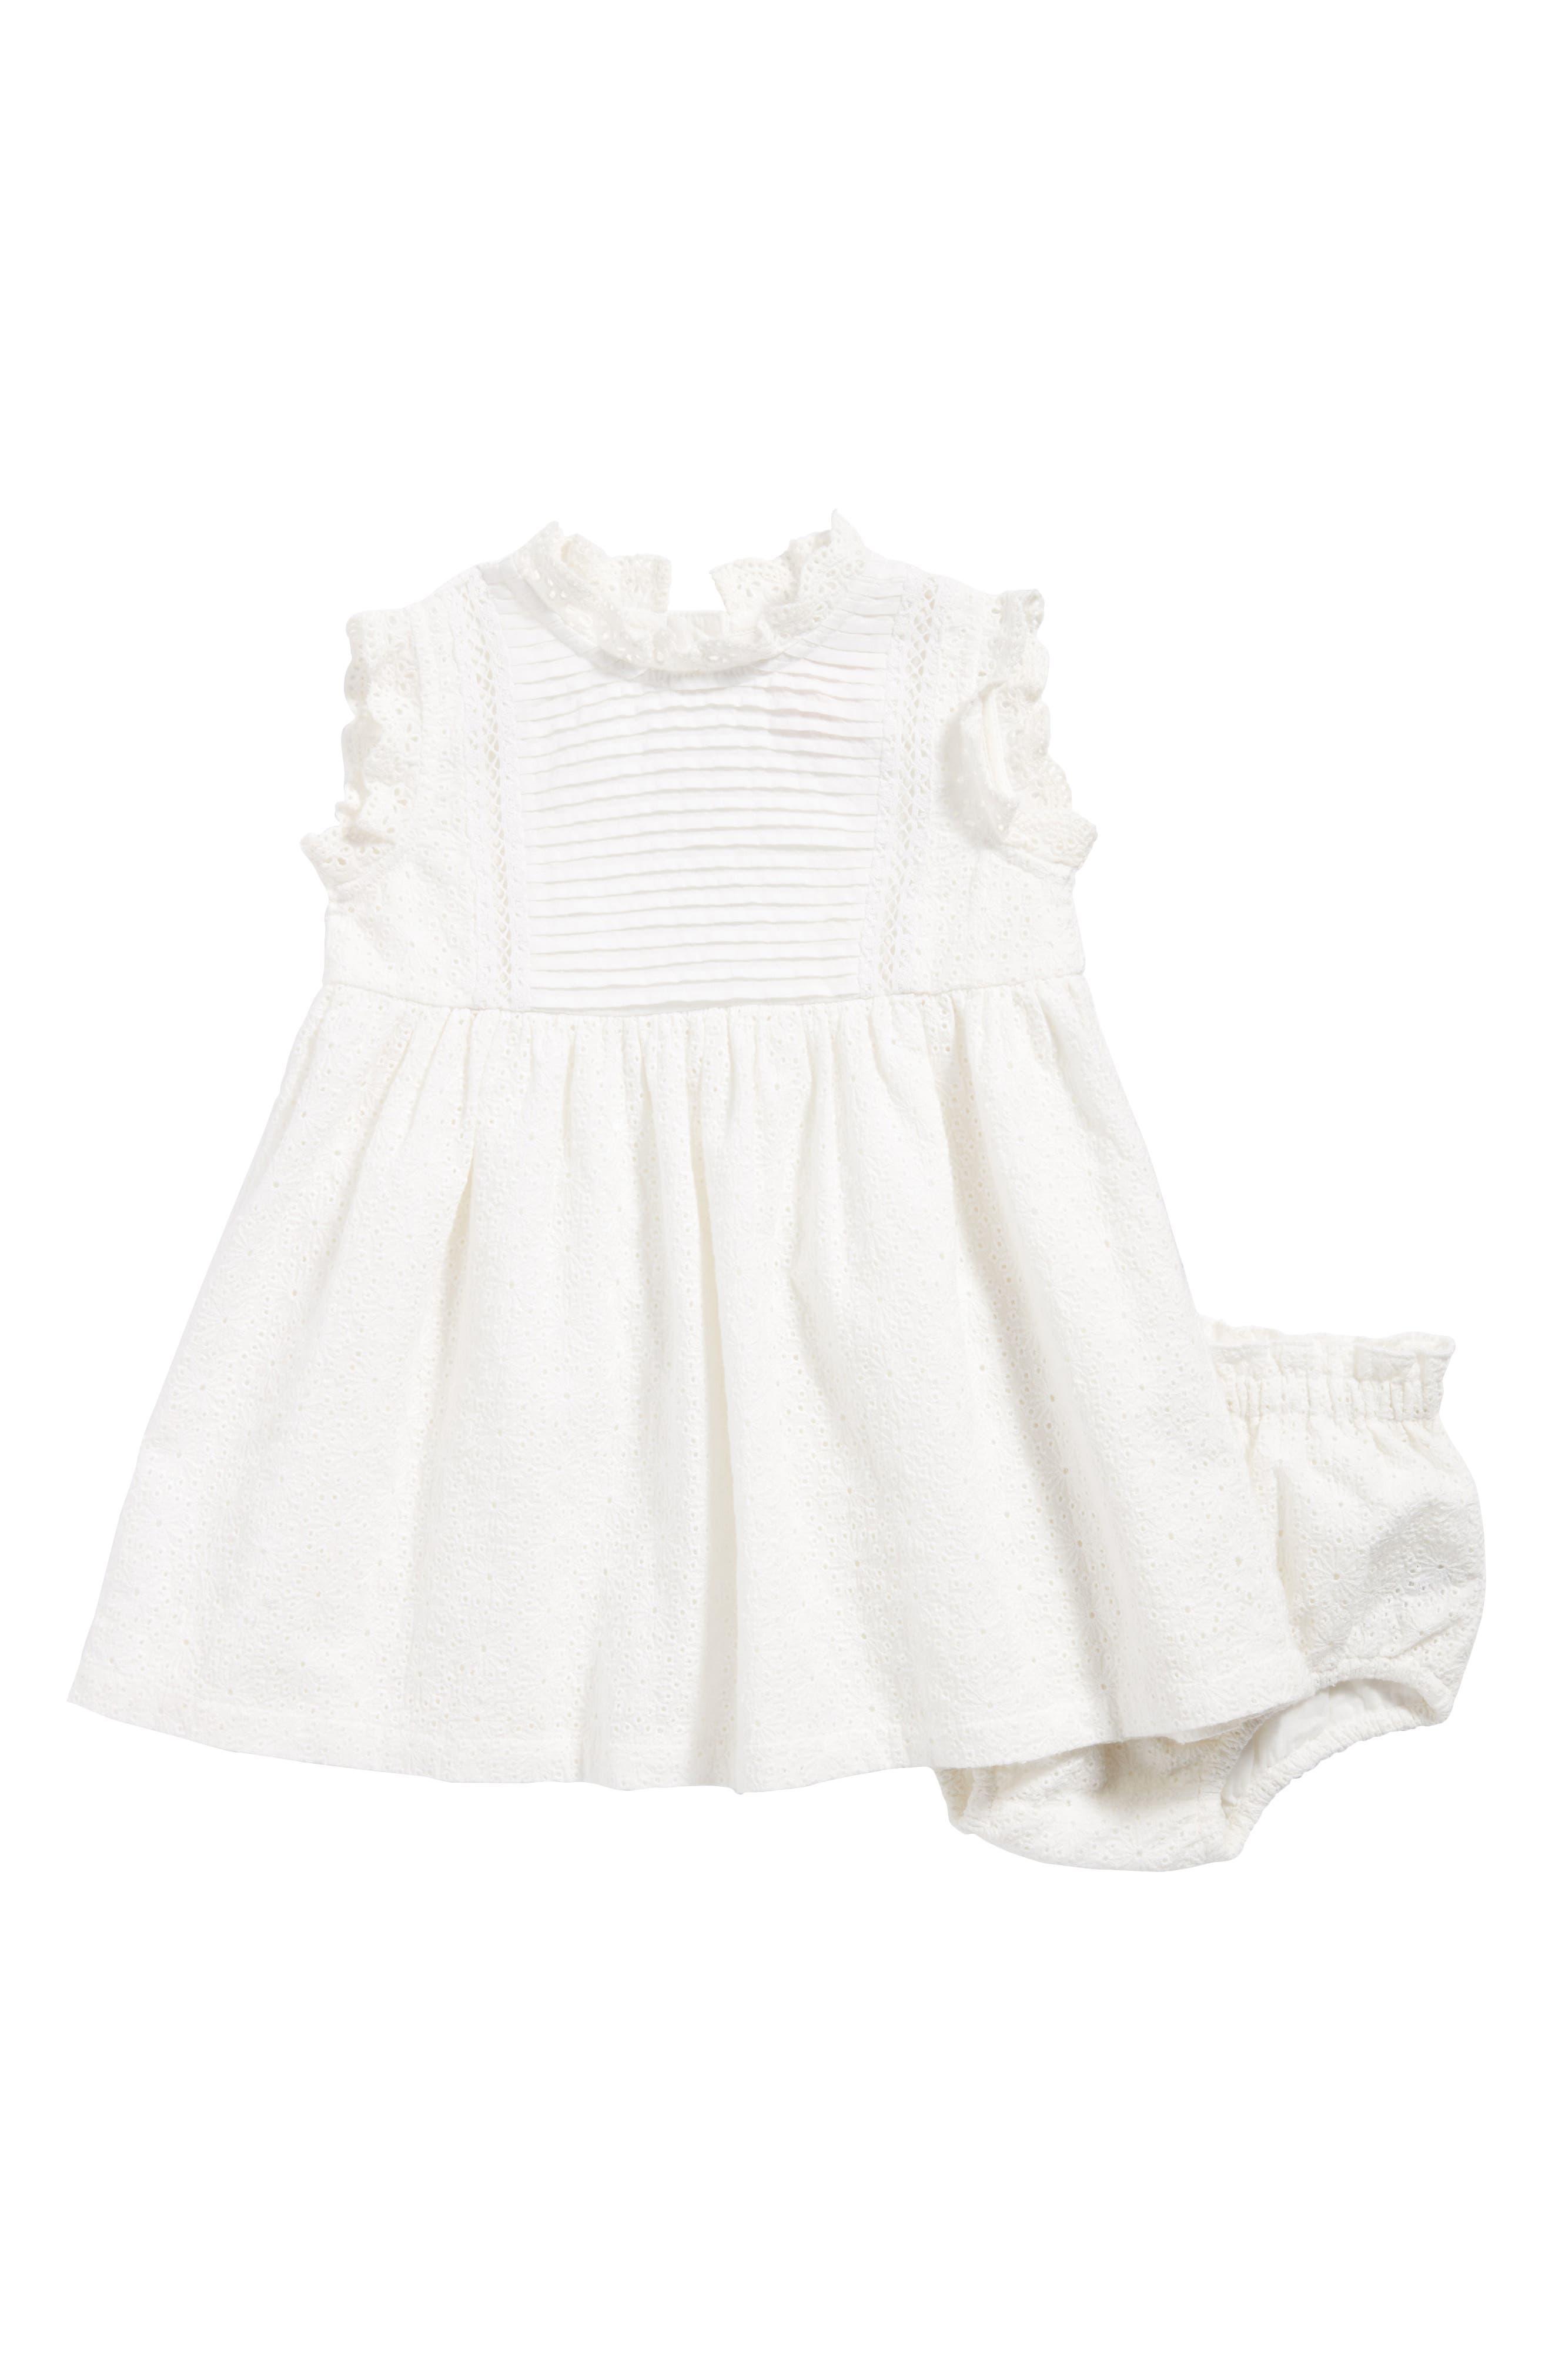 Lace Dress,                             Main thumbnail 1, color,                             White